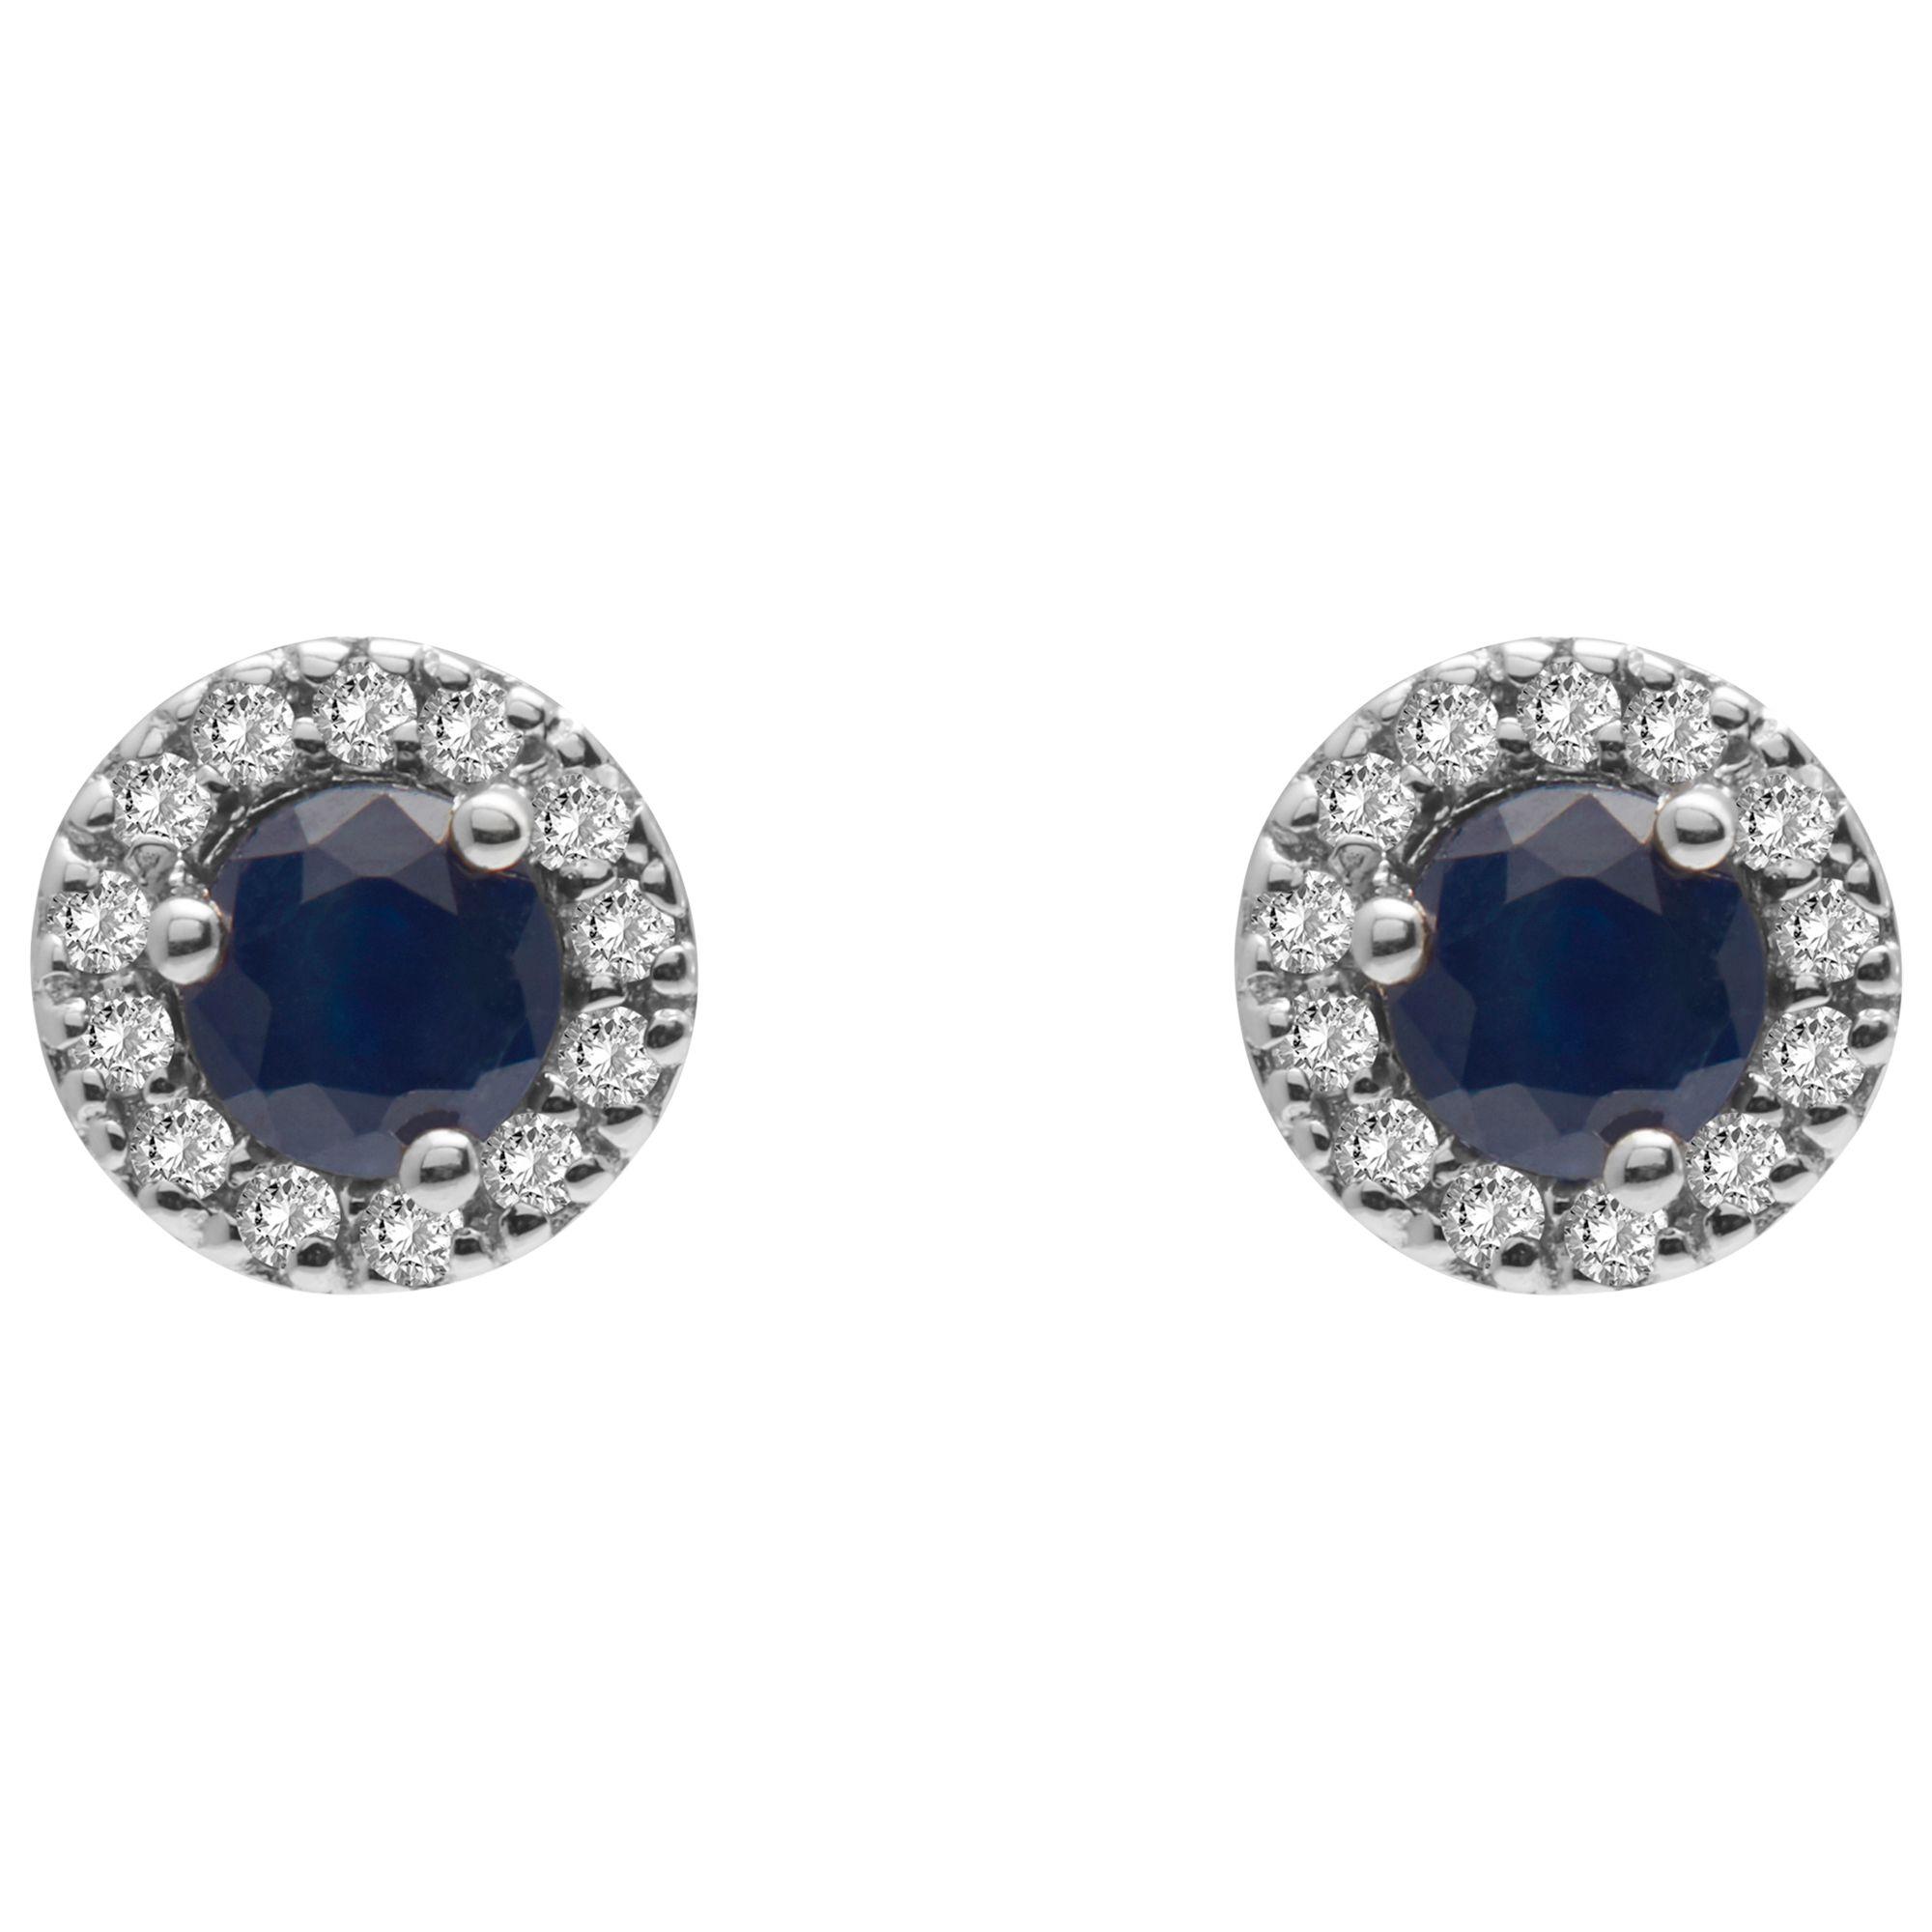 Ruby Wedding Gifts John Lewis: A B Davis 9ct Gold Diamond And Precious Stone Round Stud